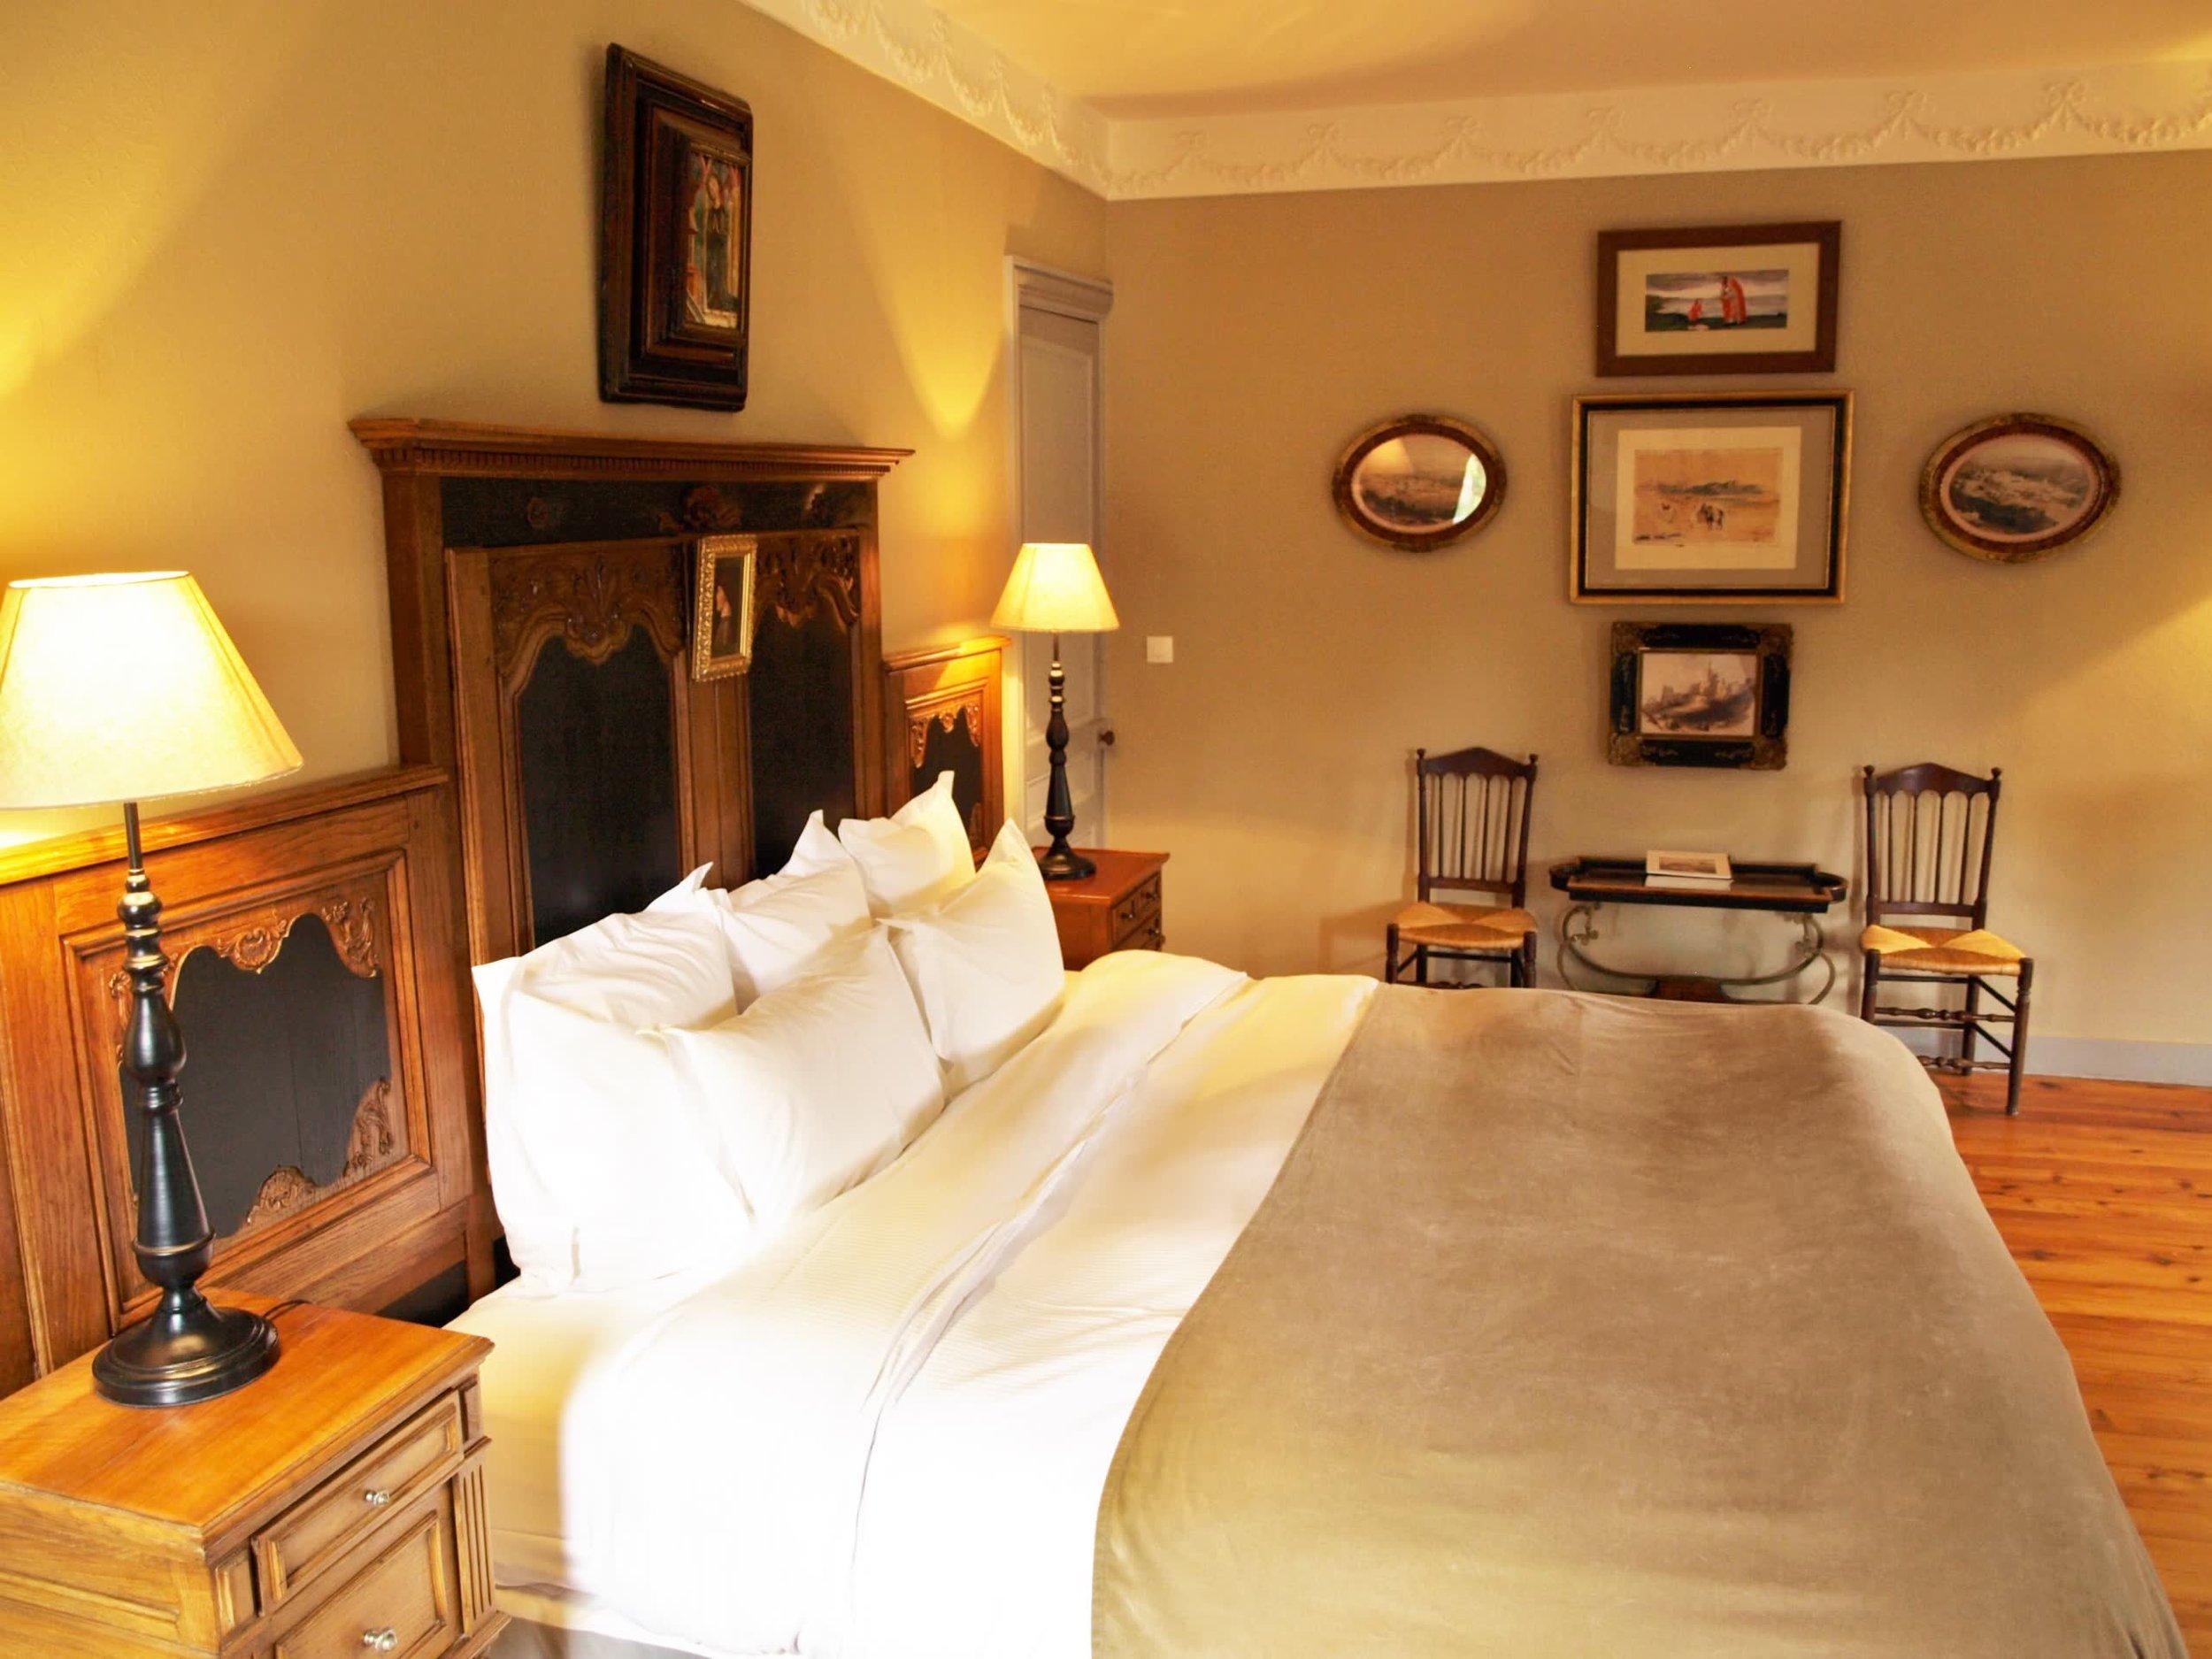 Chateau de la Pommeraye - charming boutique hotel chateau b&b spa normandy calvados bedroom Esquisses(2).jpg